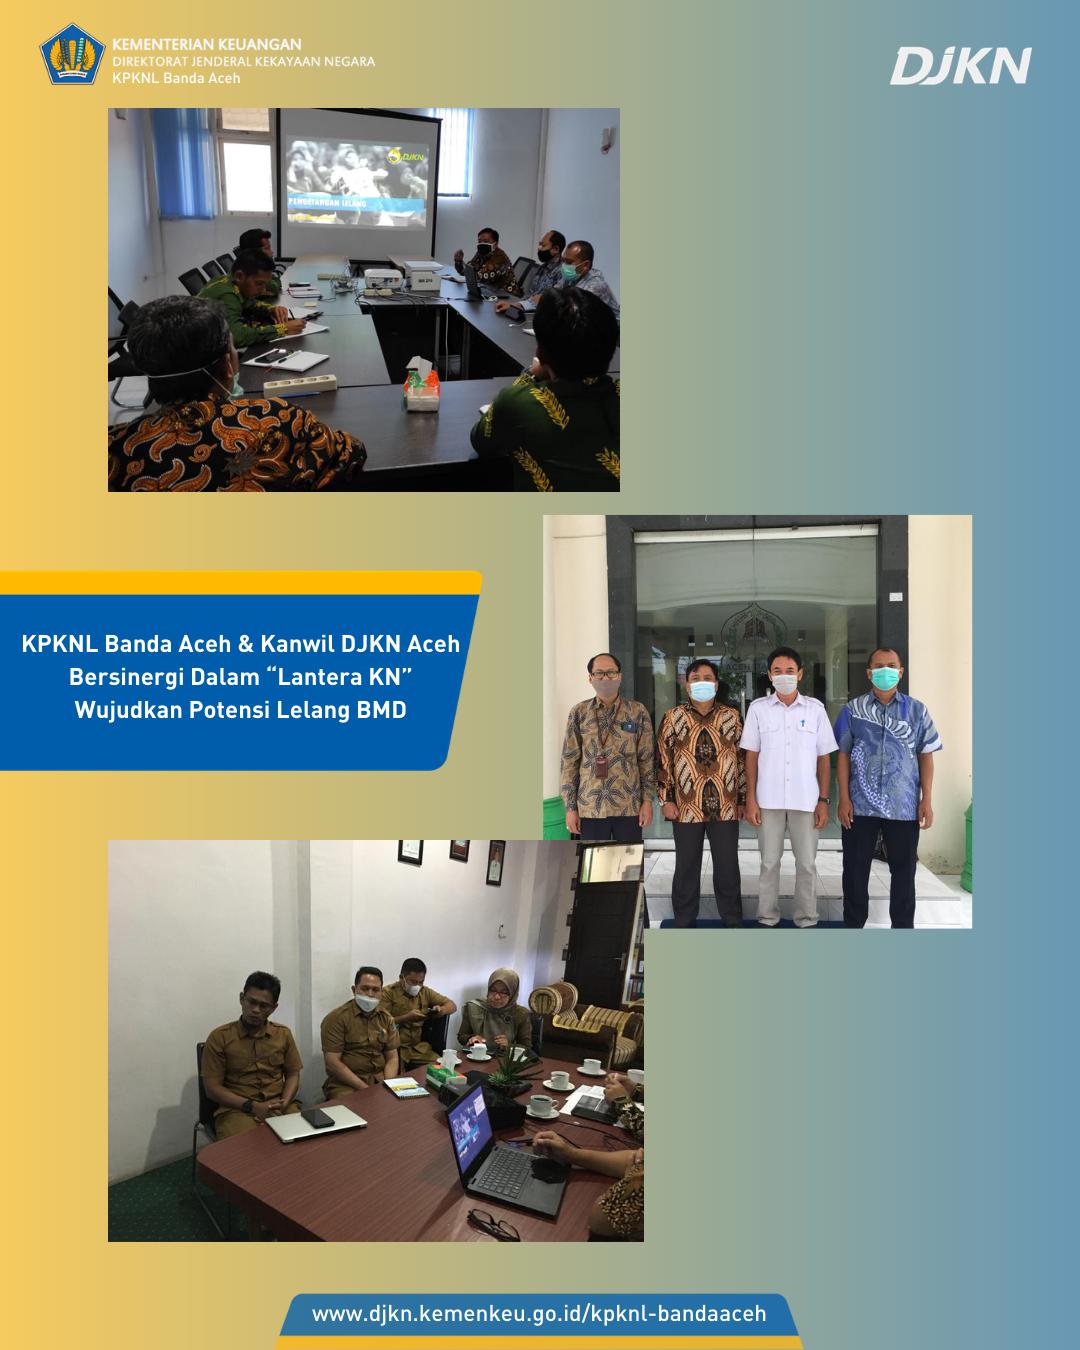 "KPKNL Banda Aceh & Kanwil DJKN Aceh Bersinergi Dalam ""Lantera KN"" Wujudkan Potensi Lelang BMD"